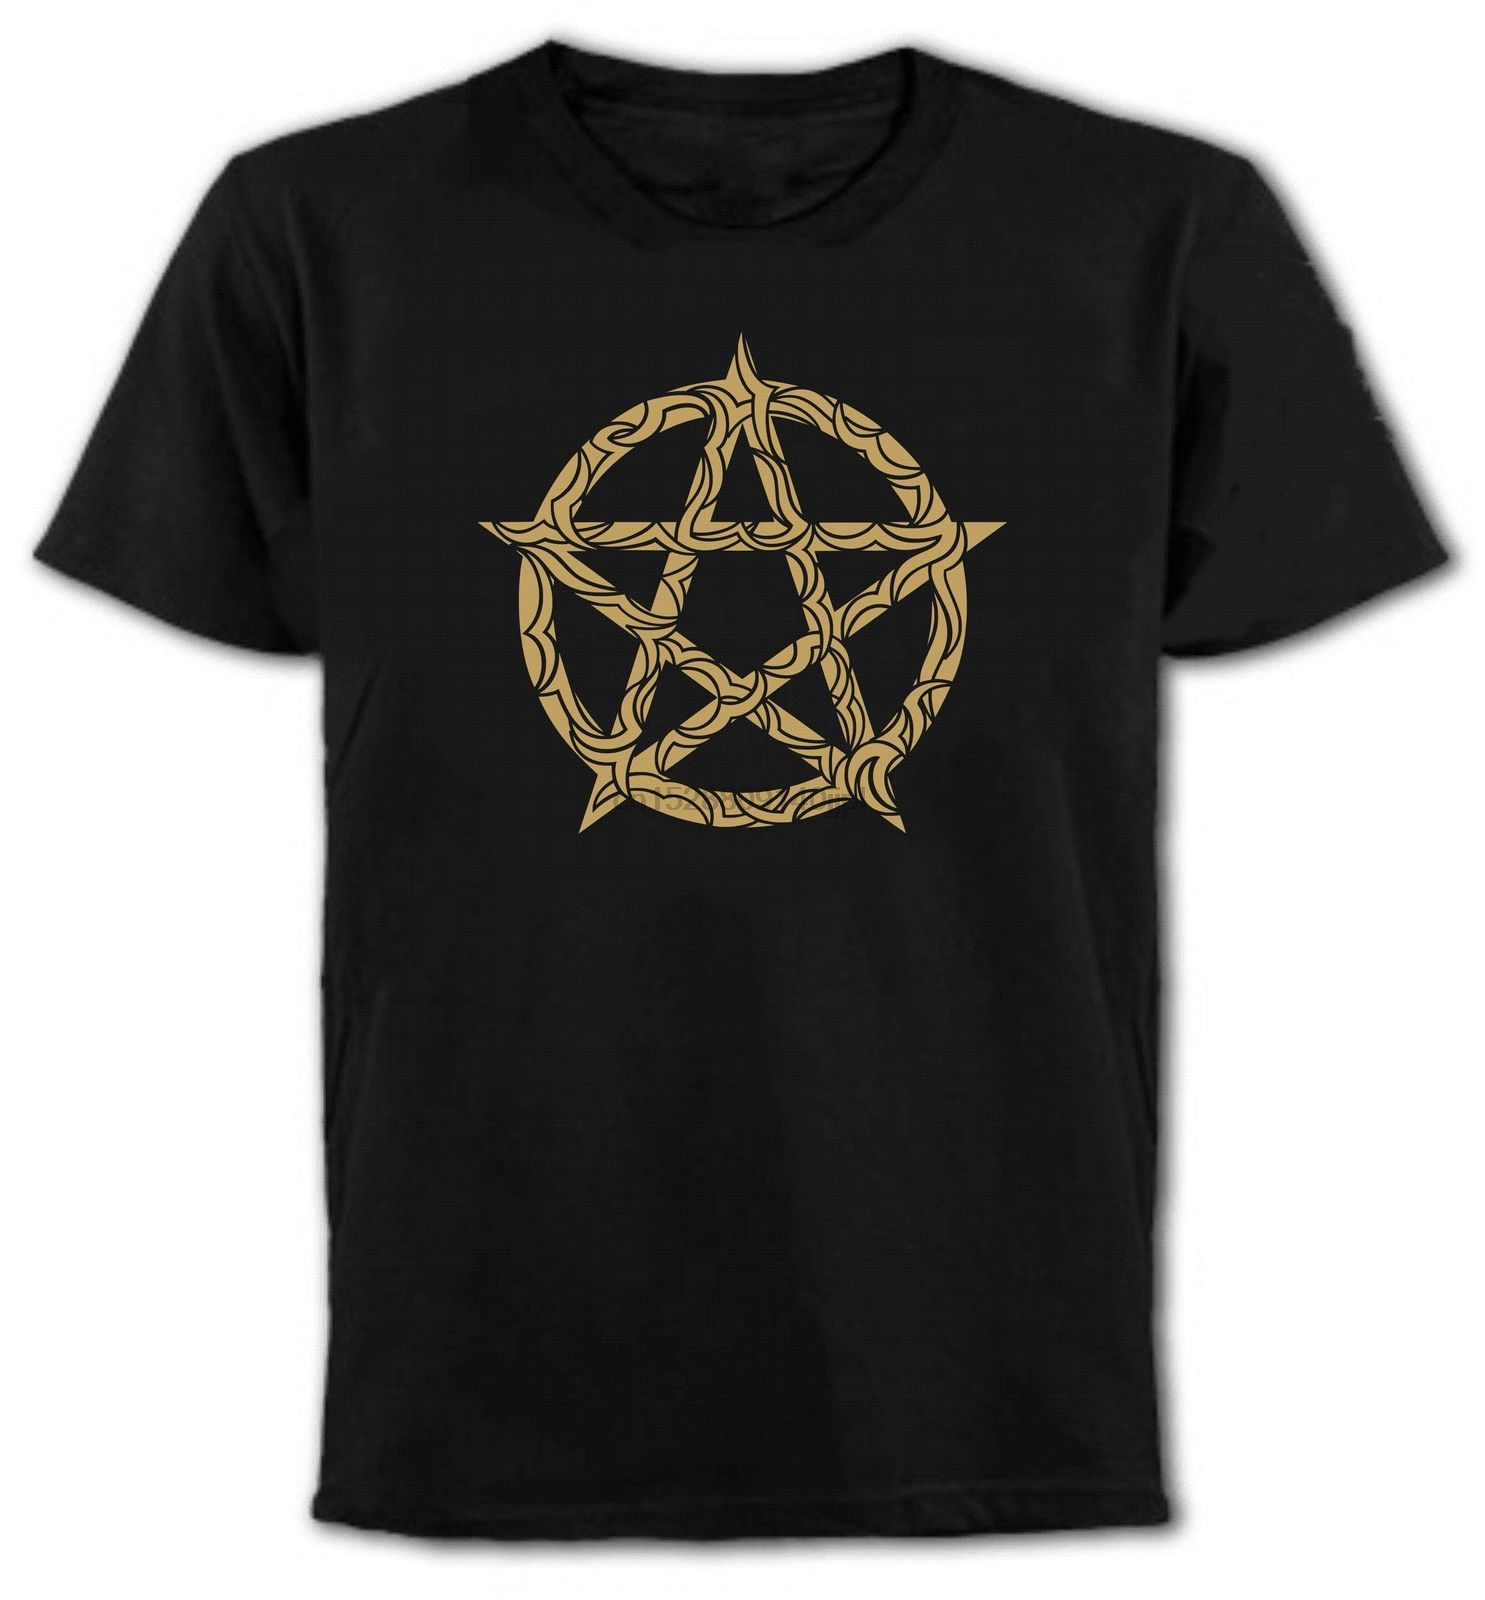 New Summer Style Fashion Short Sleeve Pentagrama T-Shirt - Gothic Rock Punk Emo Magical Pagan Wicca T Shirt Design(China)